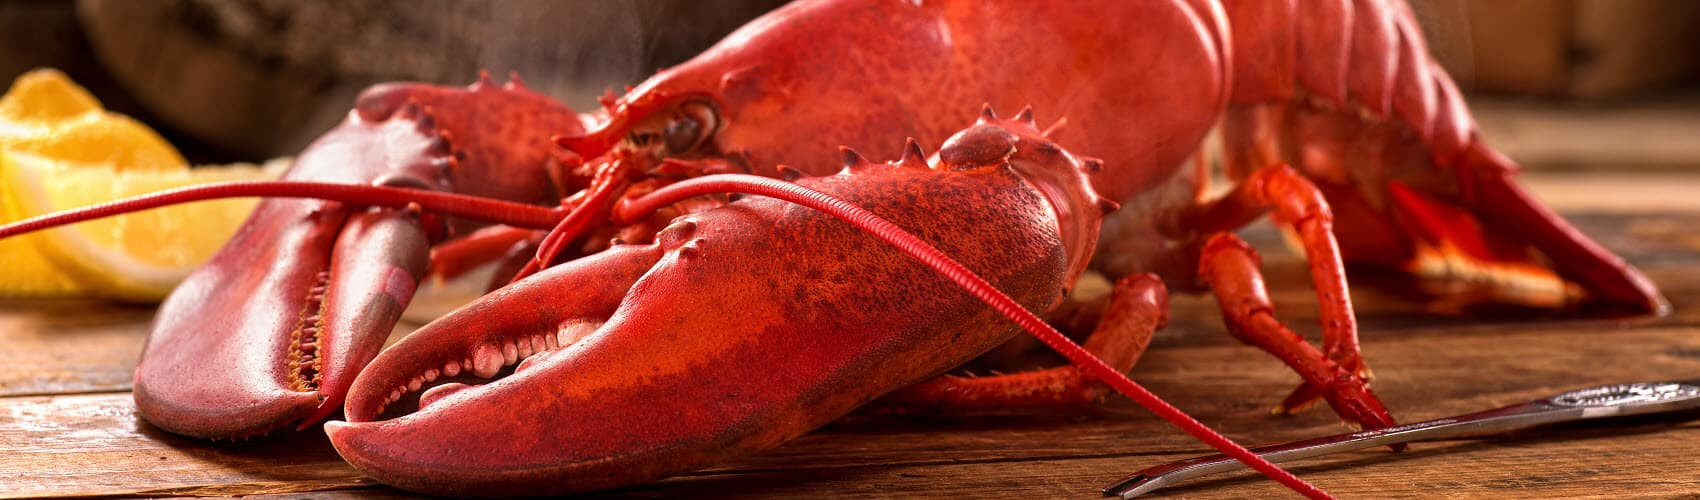 National Lobster Day near Port Charlotte FL